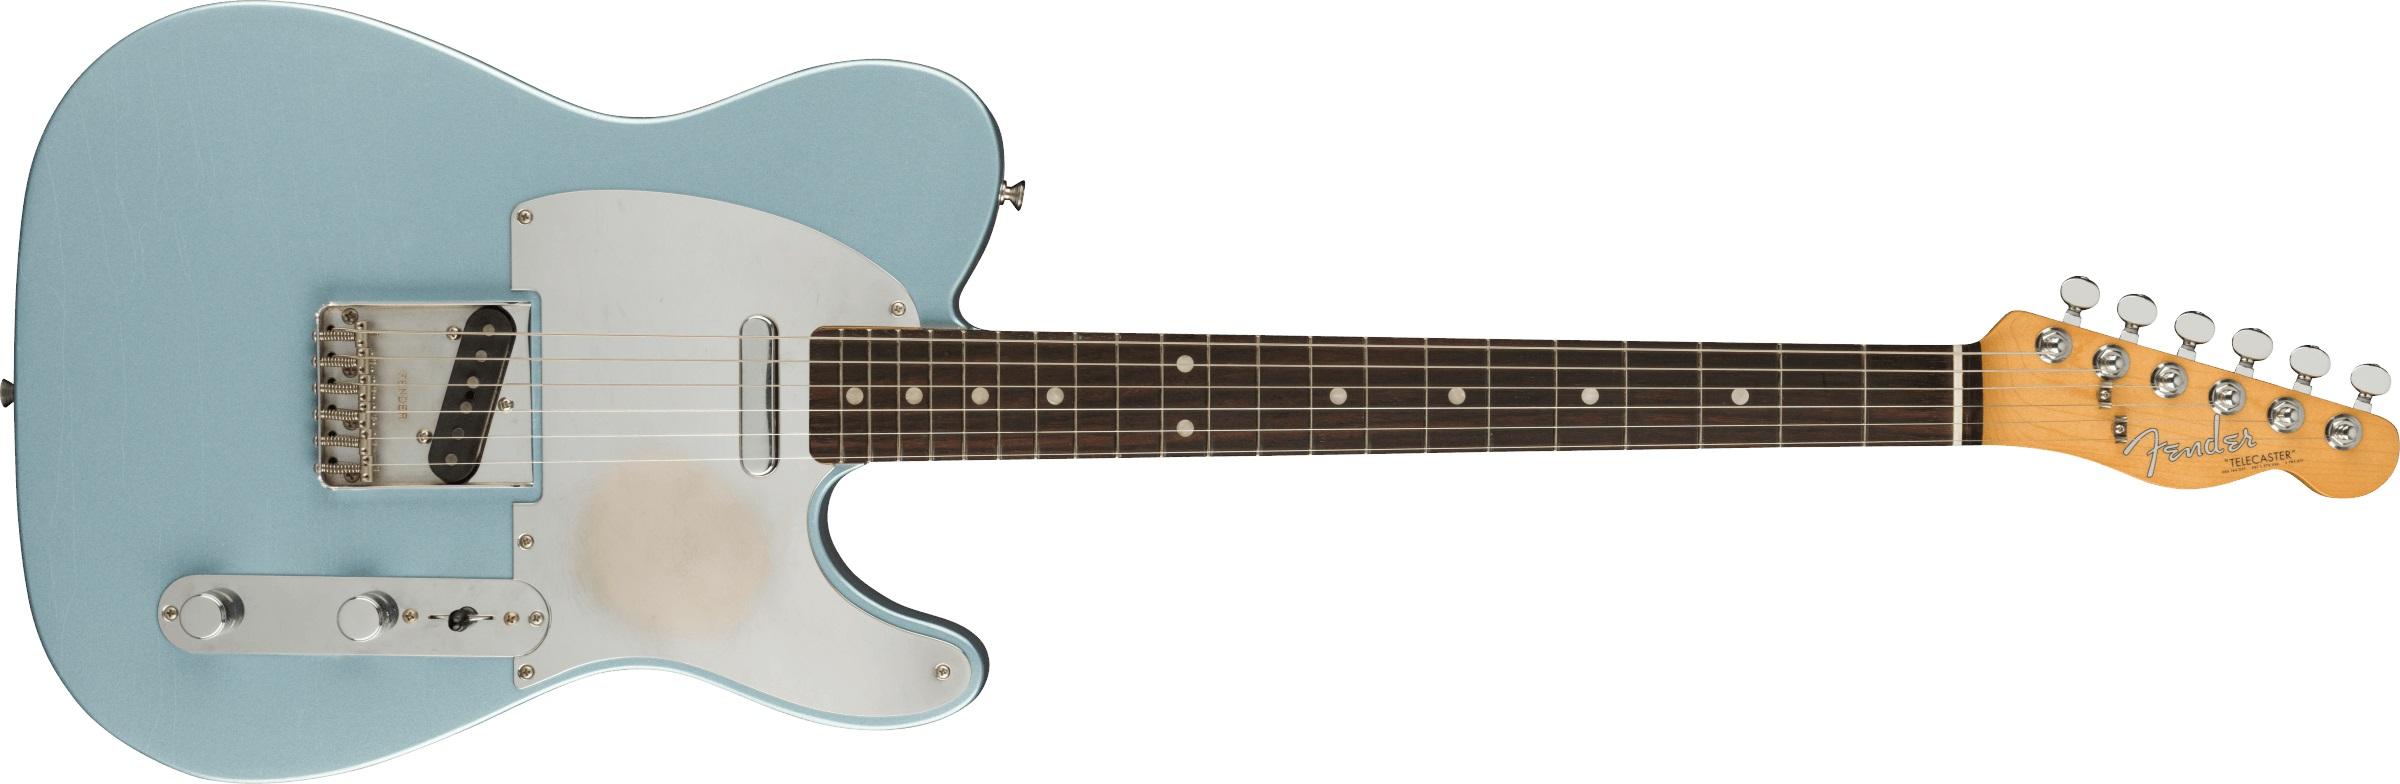 Fender Chrissie Hynde Telecaster RW IBM